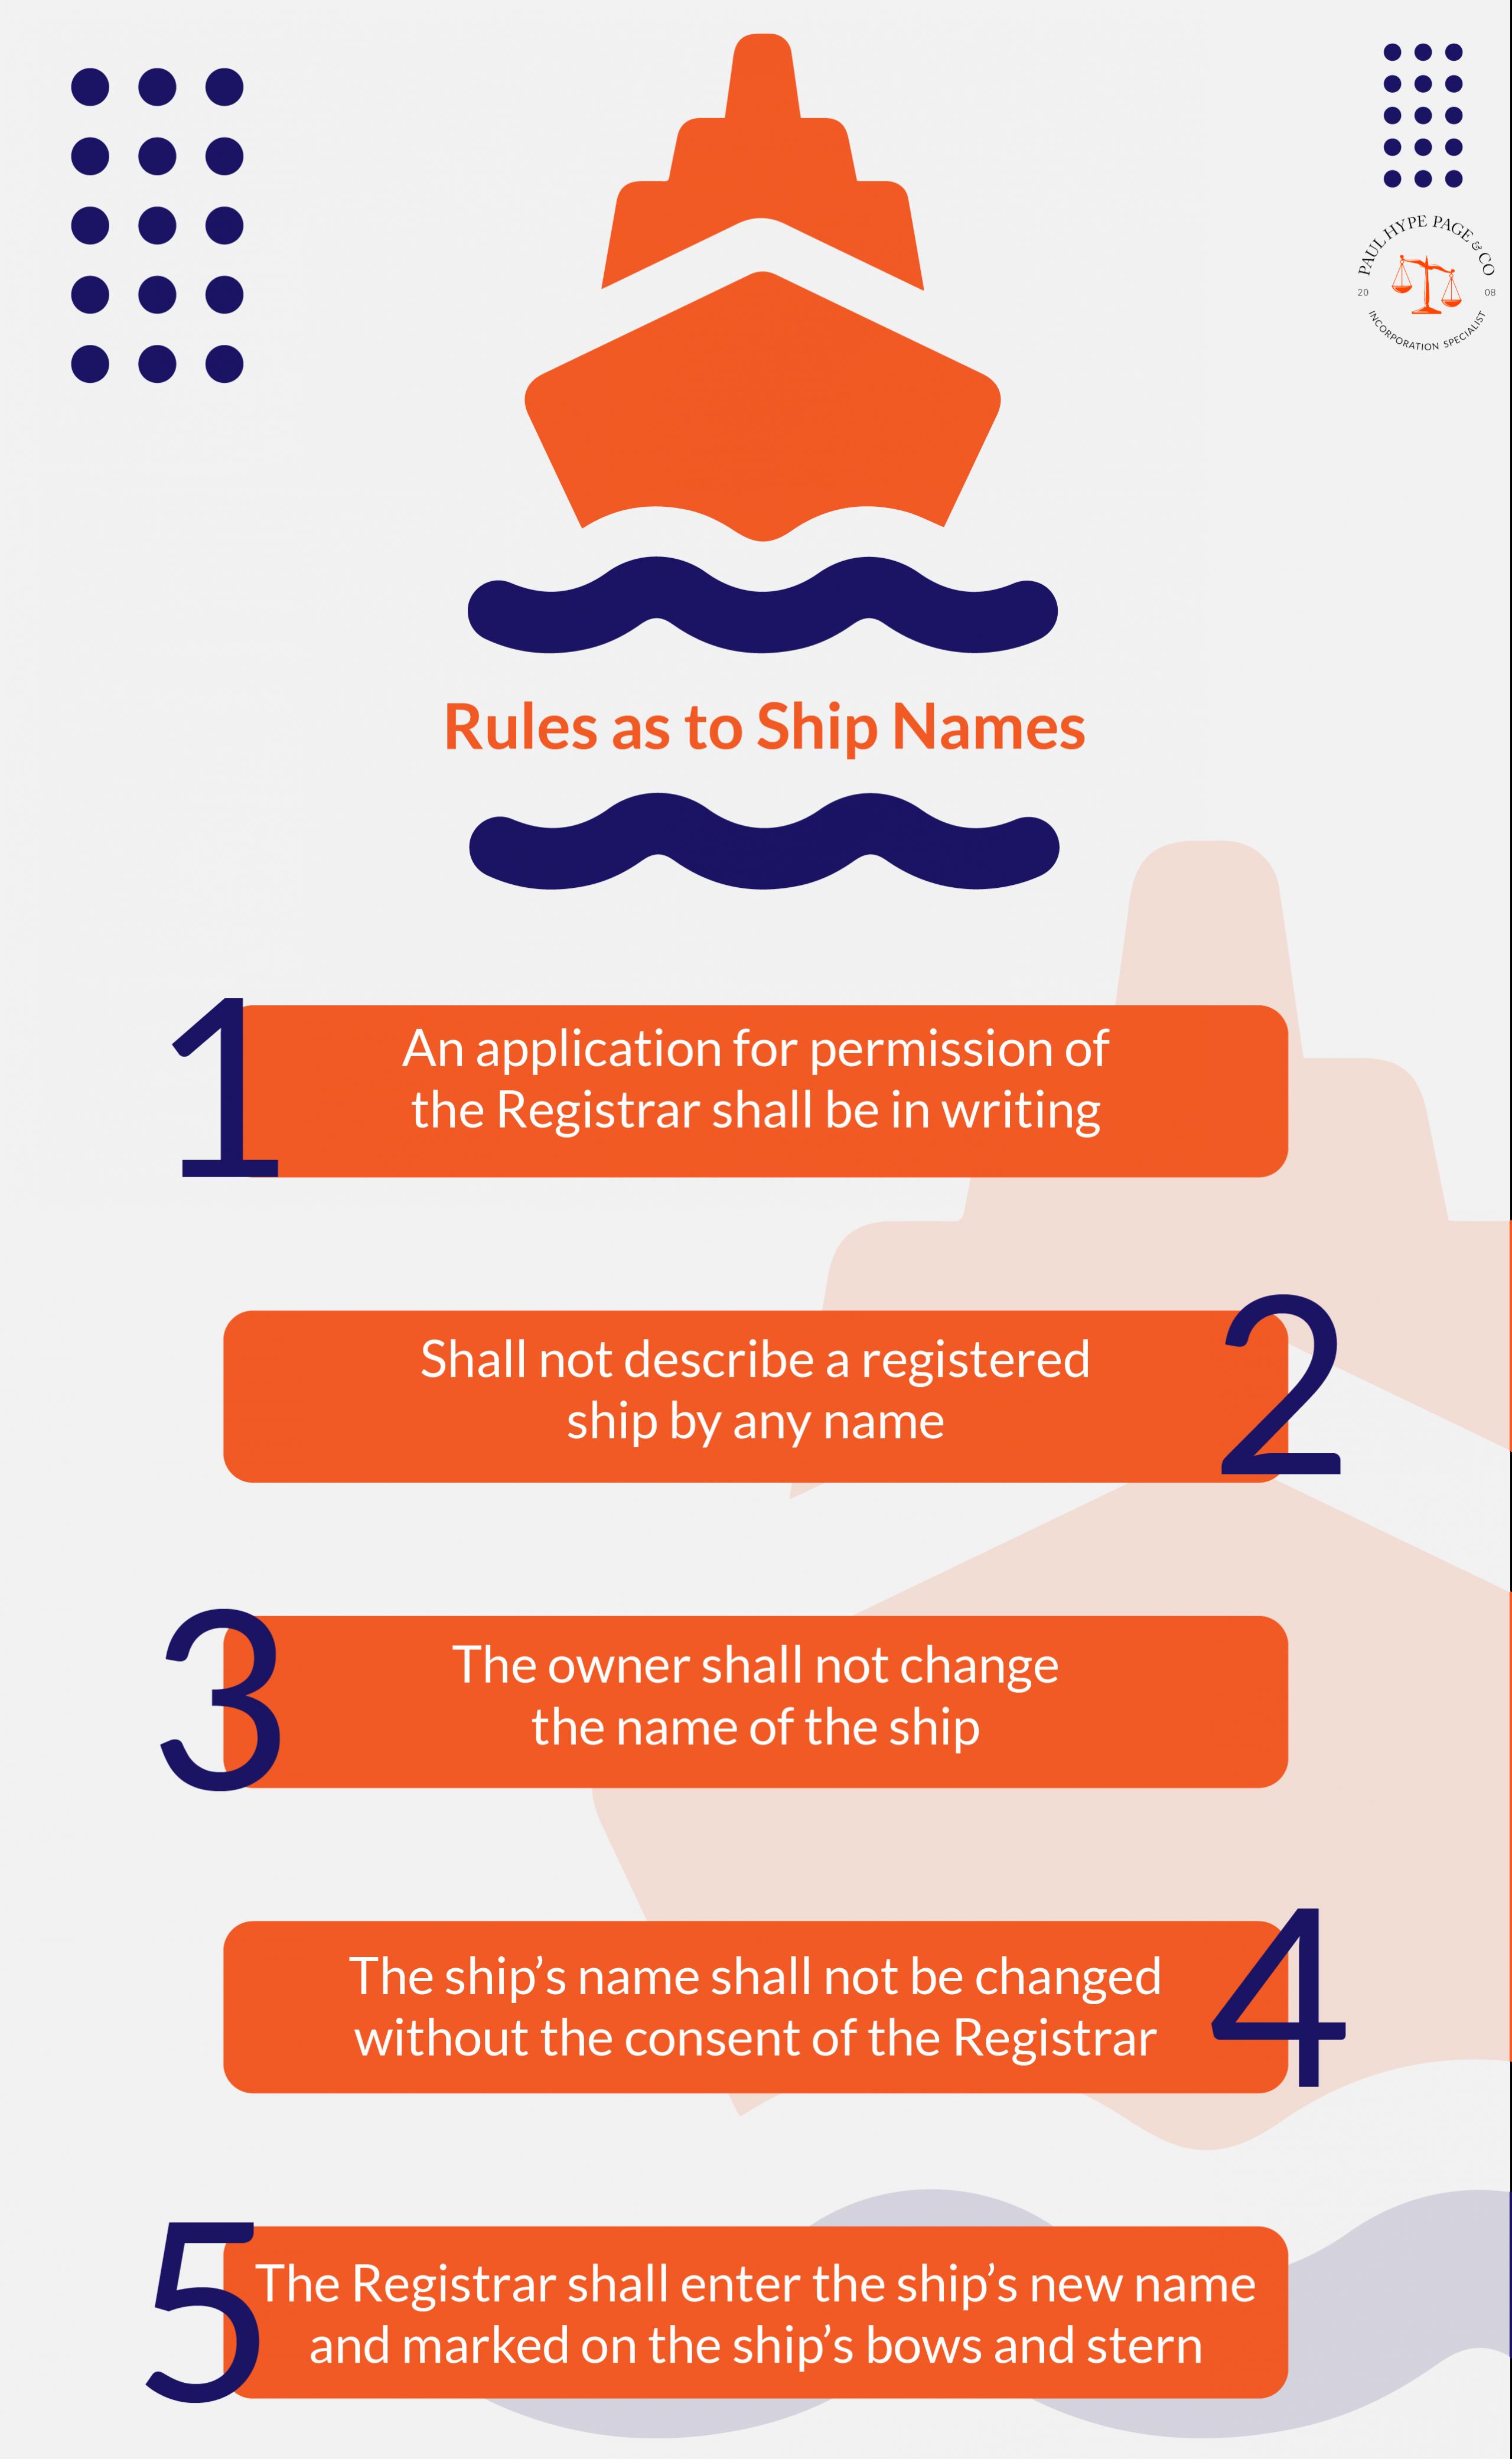 Ship Names Regulations